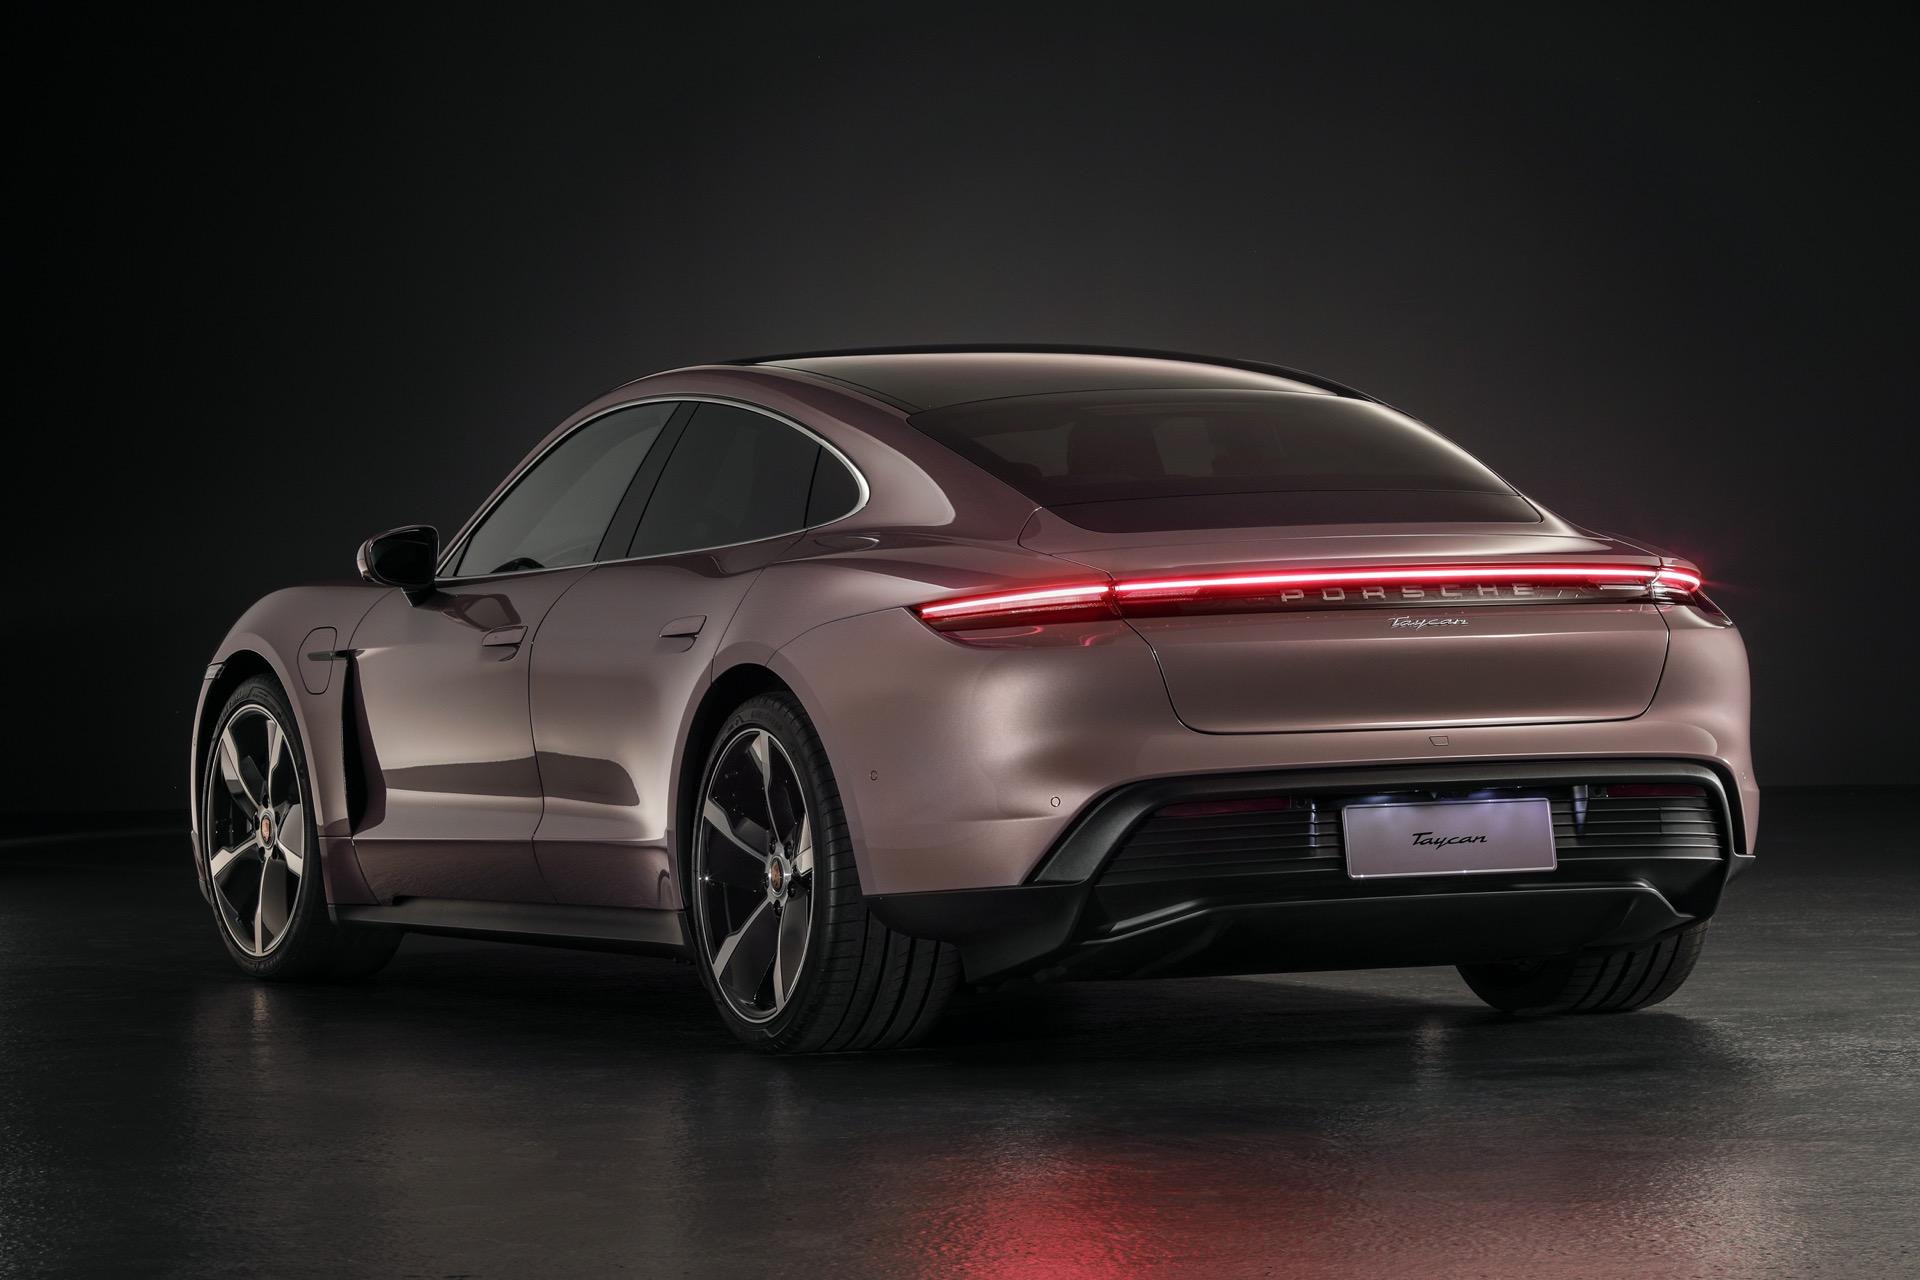 Base Porsche Taycan, McLaren rescue loan, Ford Ranger accessories: Today's Car News